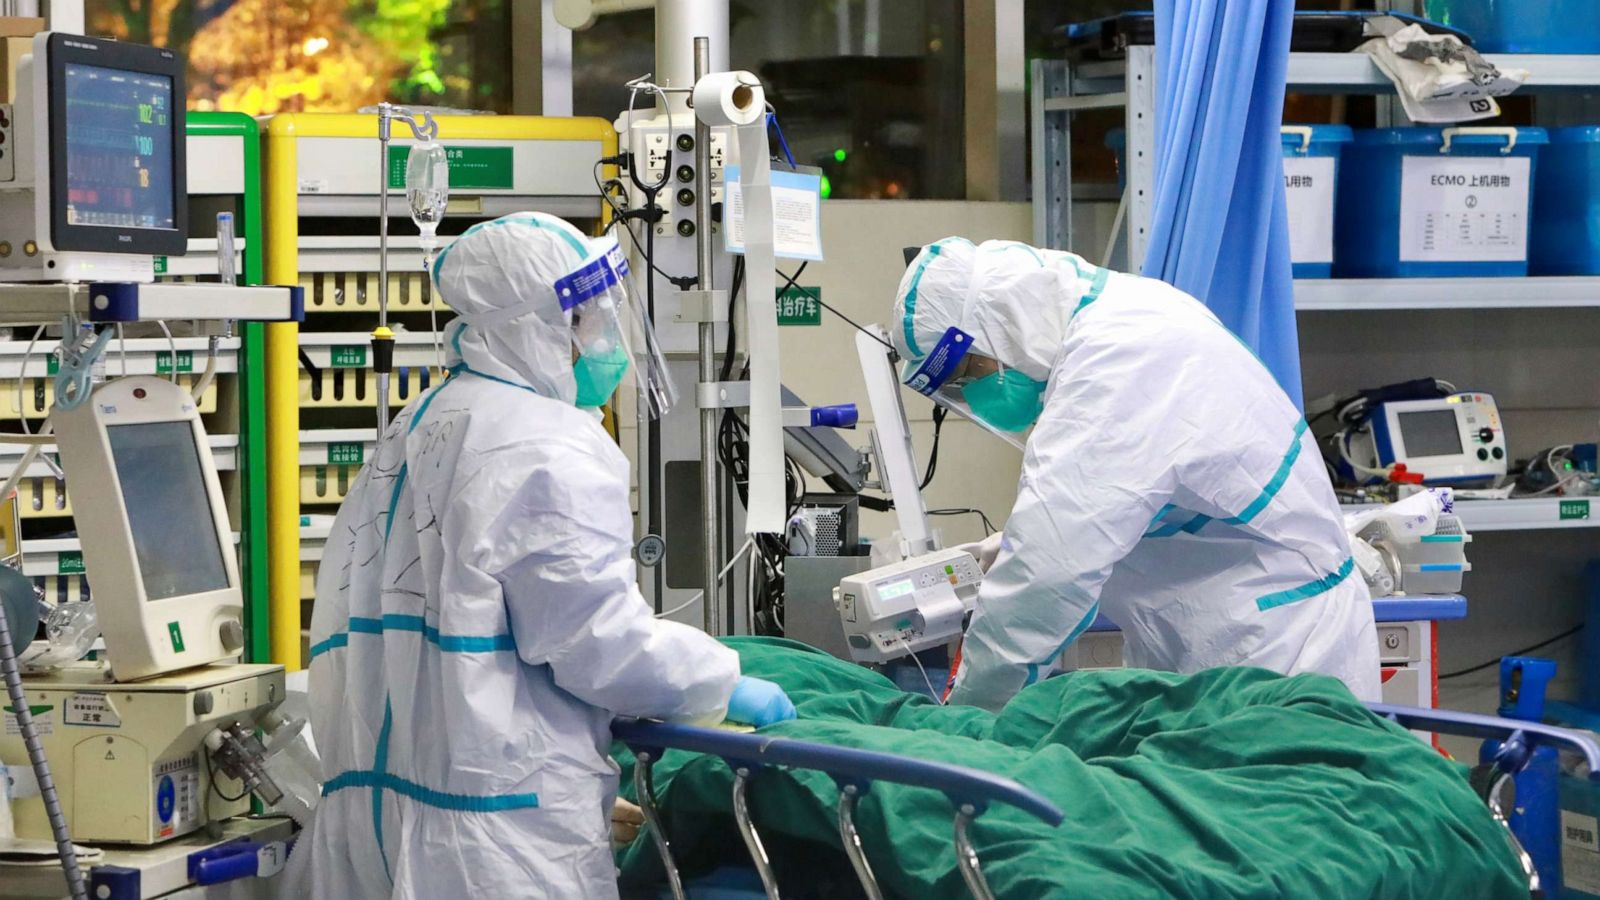 Nigerian Coronavirus Patient Bites Nurse In China